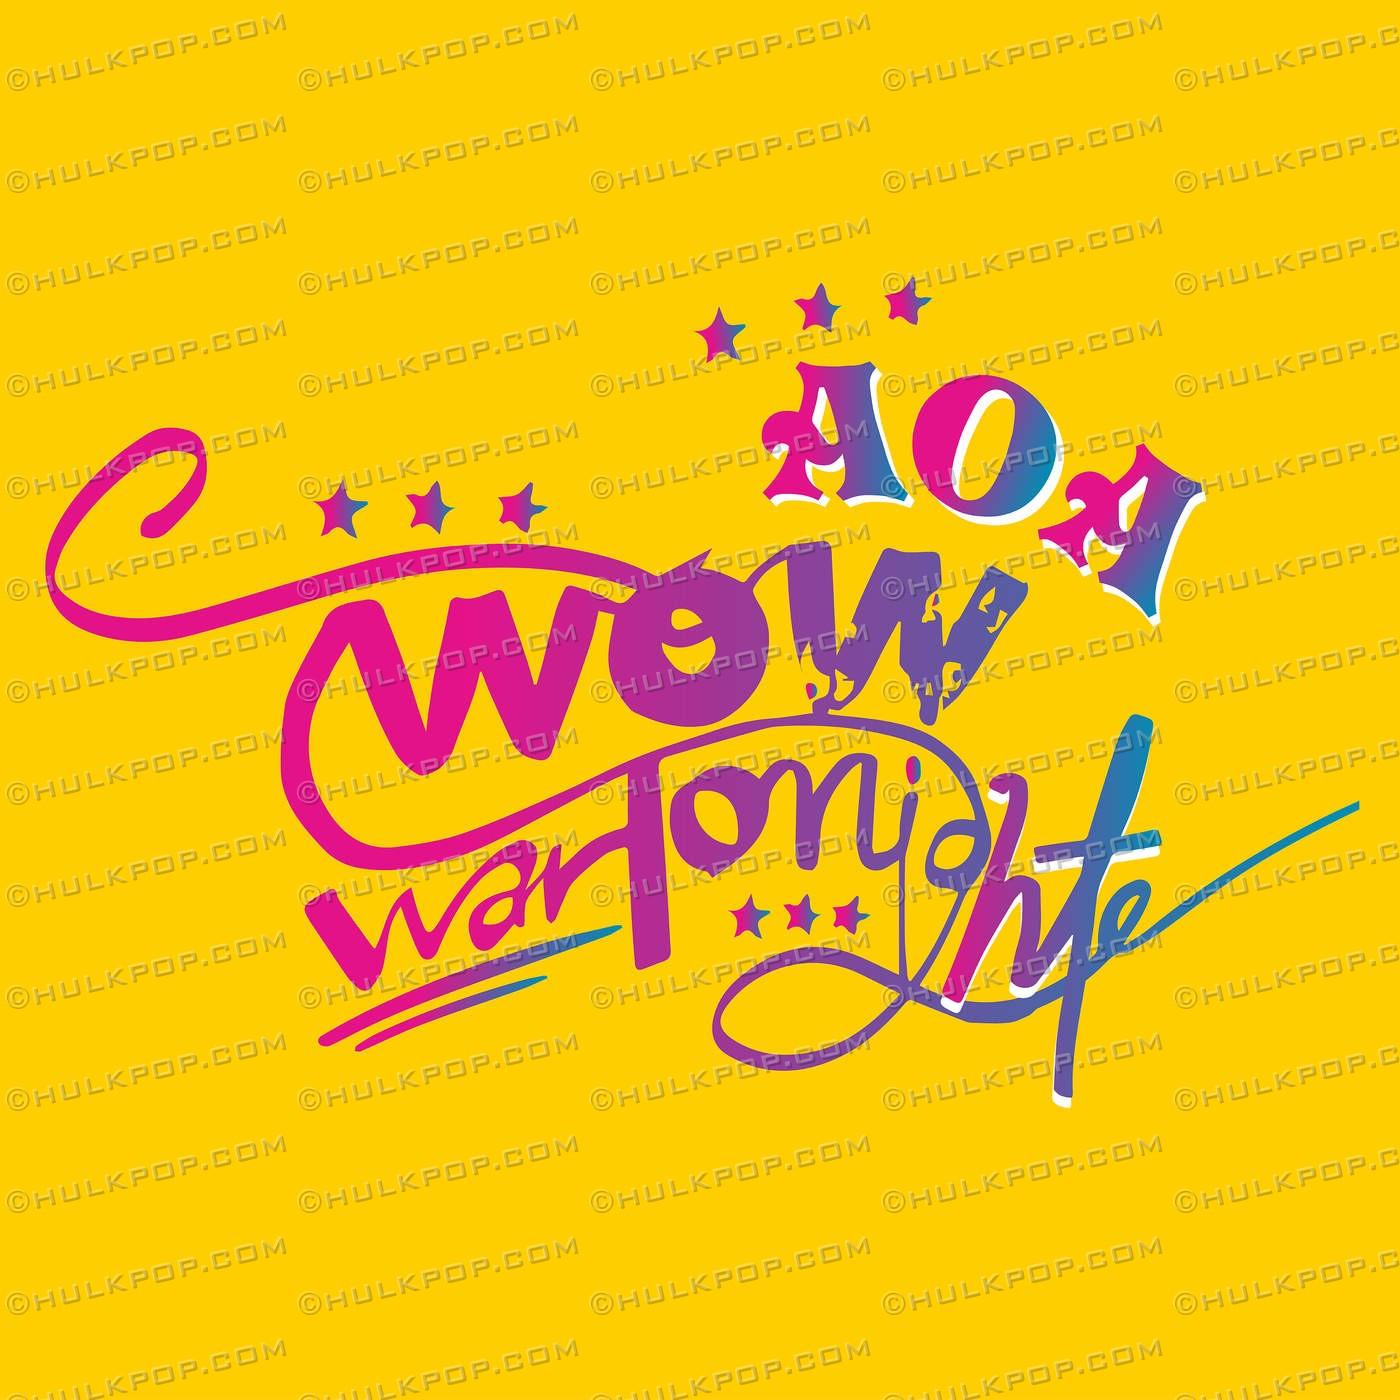 AOA – WOW WAR TONIGHT 〜時にはおこせよムーヴメント (girls ver.) – Single (ITUNES PLUS AAC M4A)